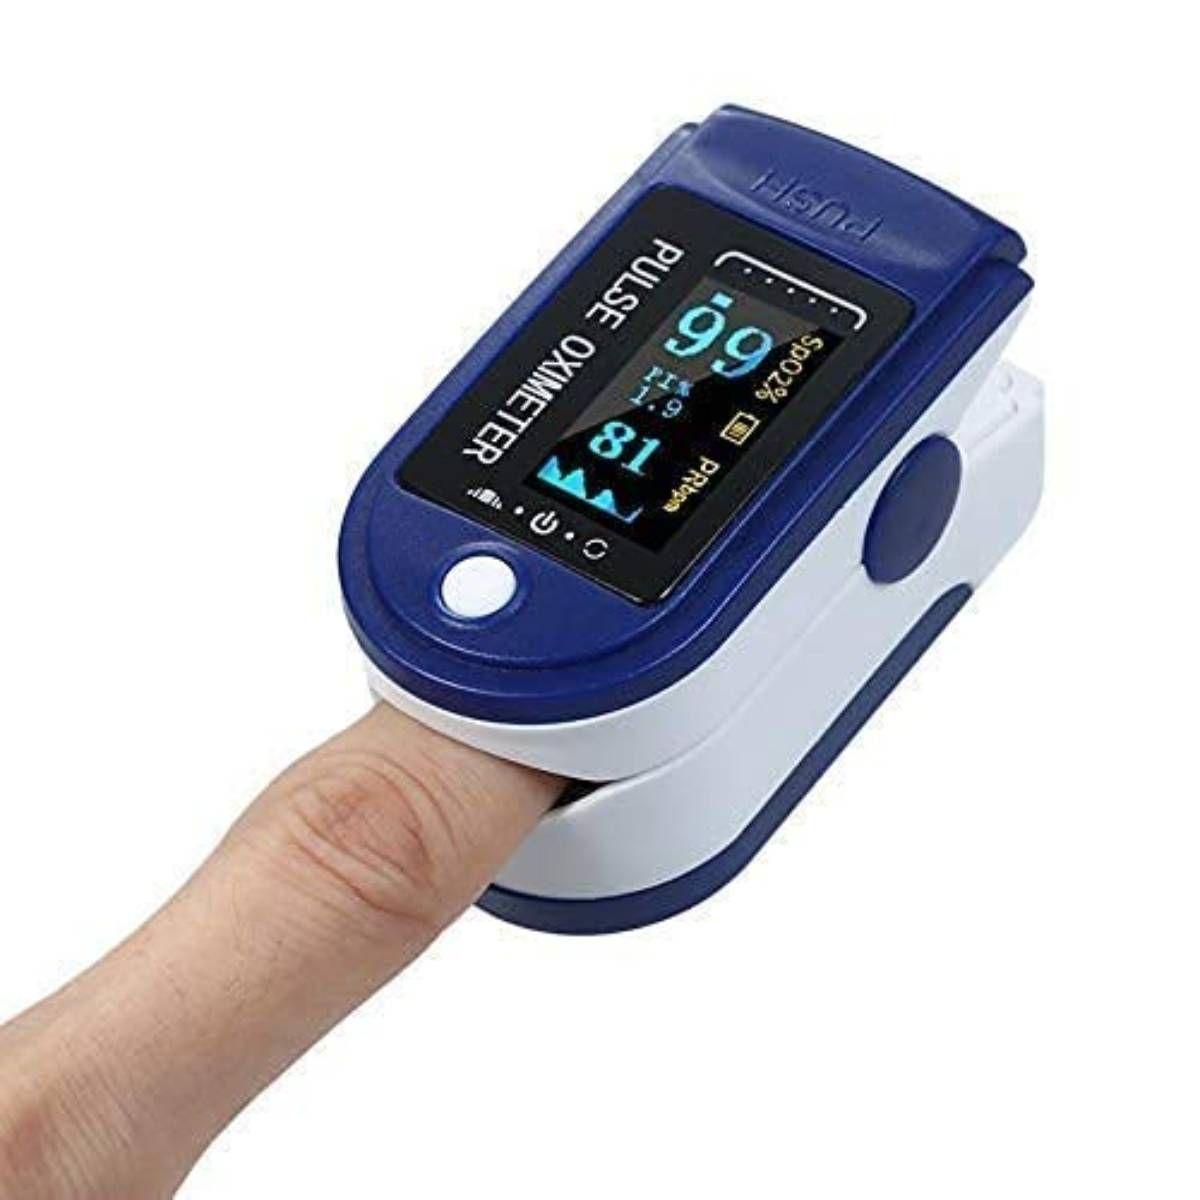 Tudox 500BL Fingertip पल्स Oximeter